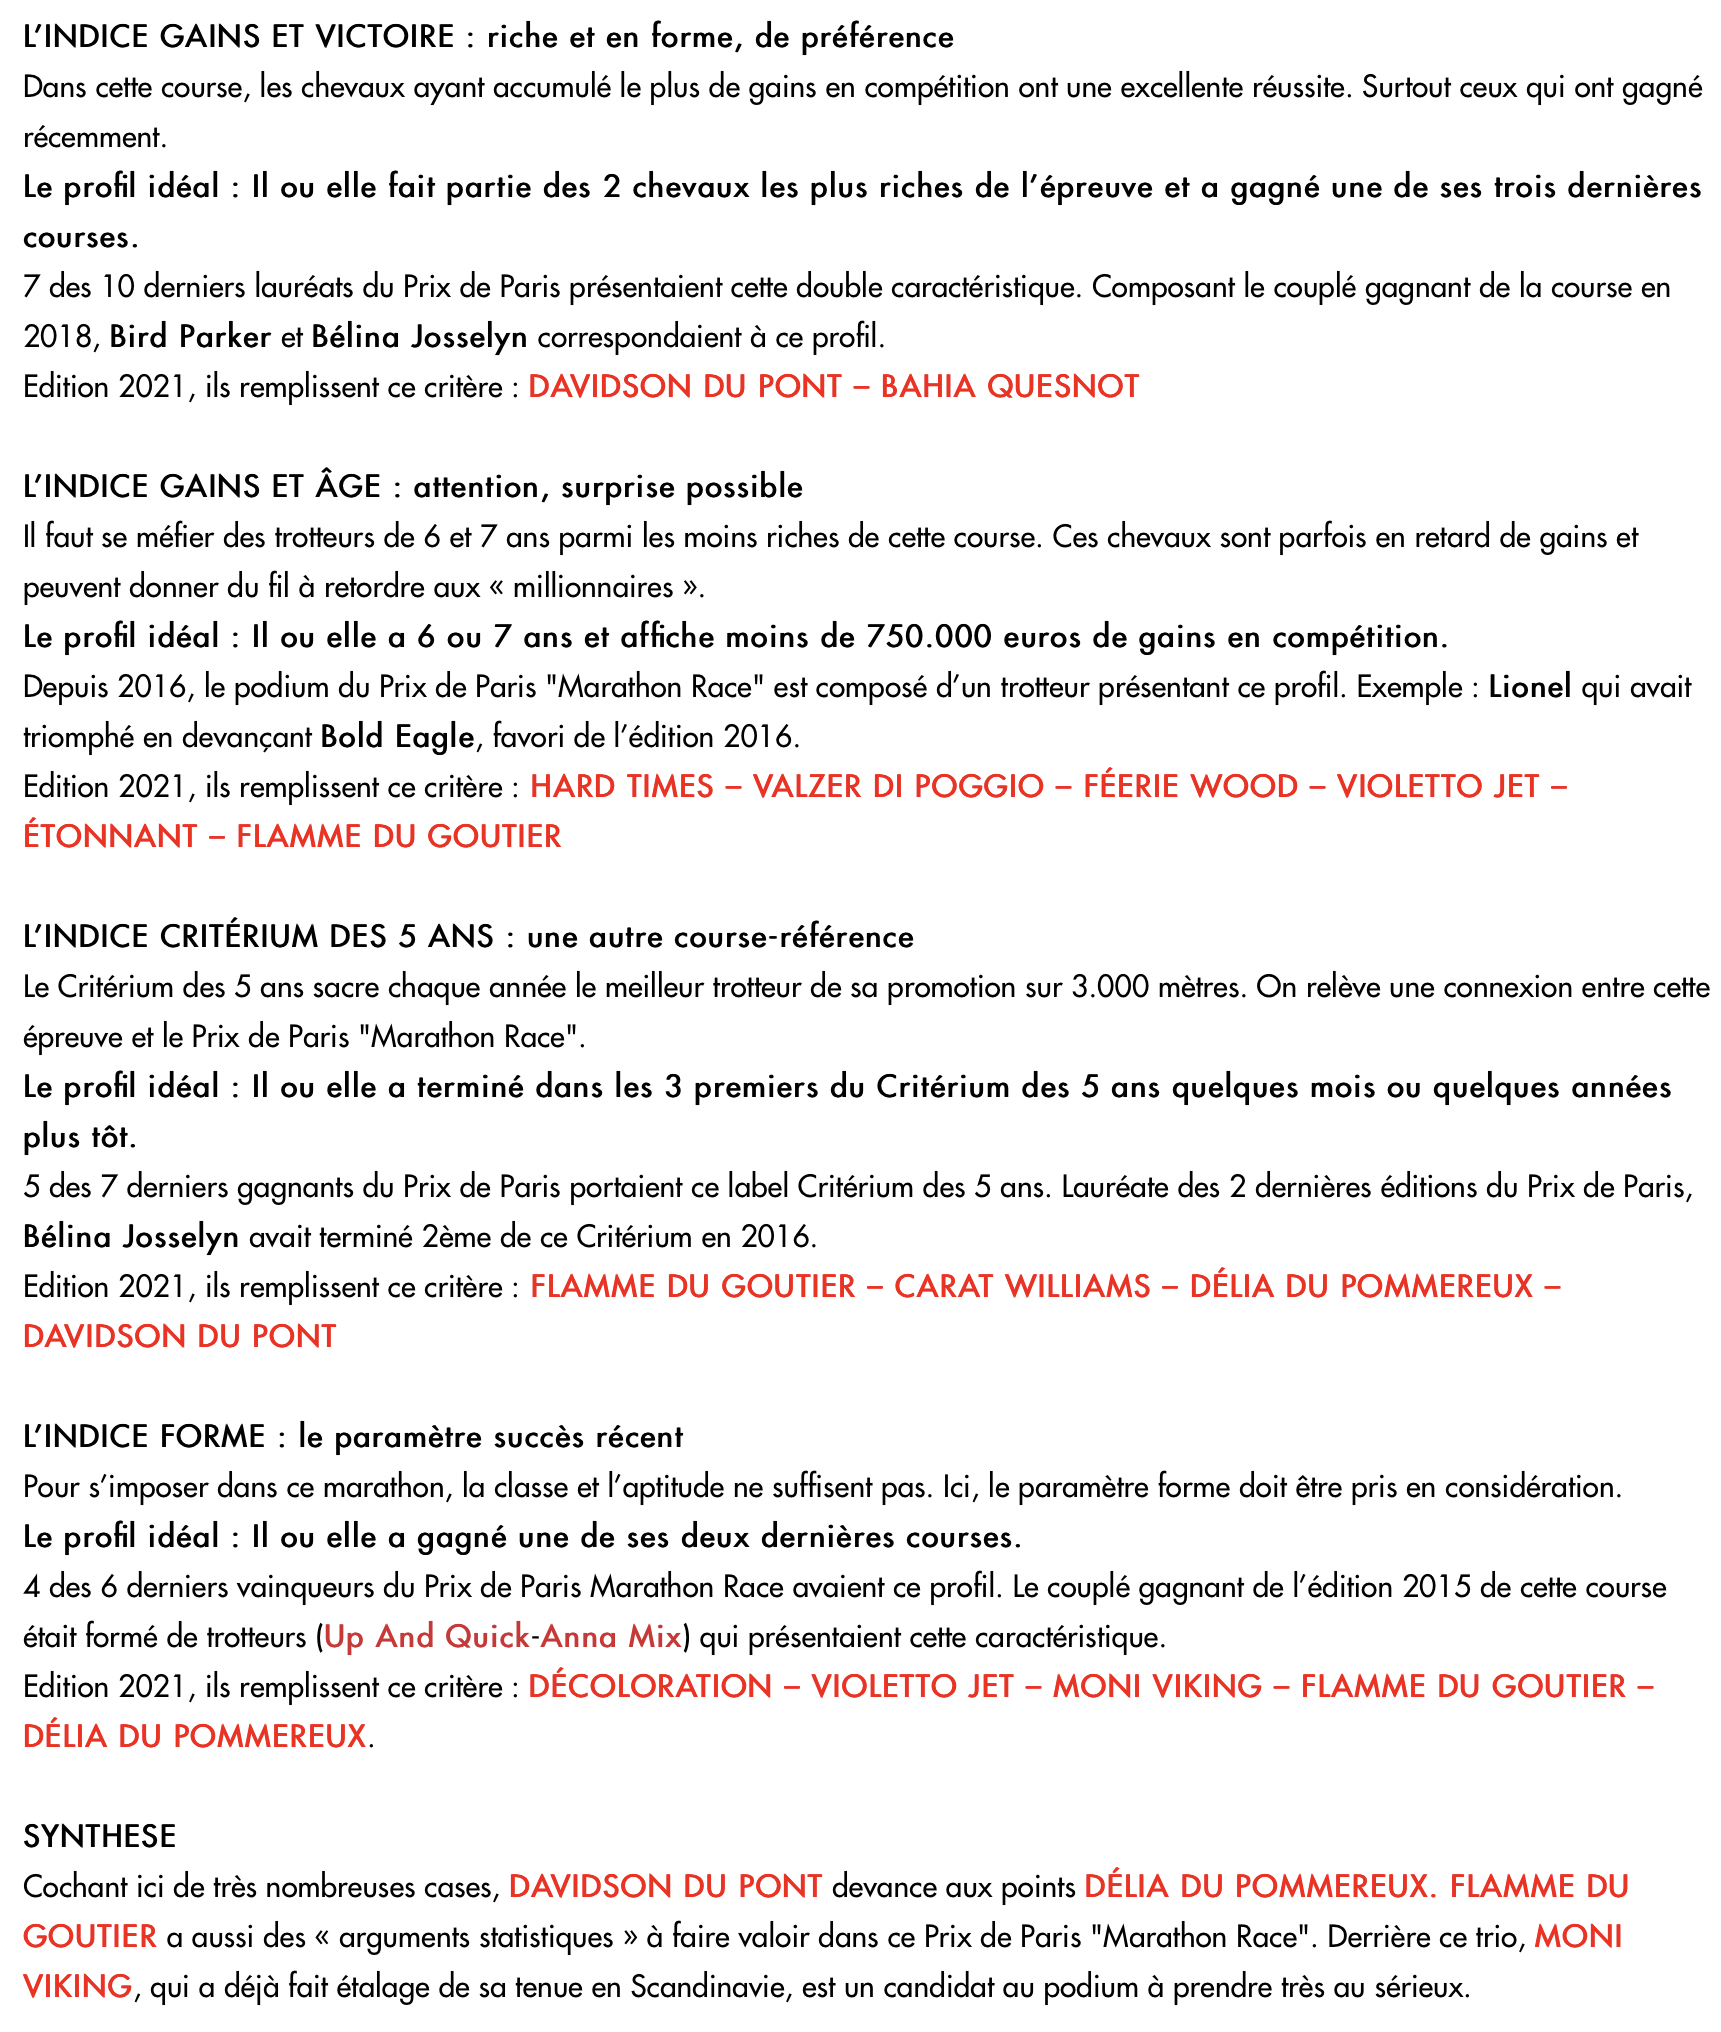 F50D6147-AE04-4E9F-A0E1-463E15C1057F